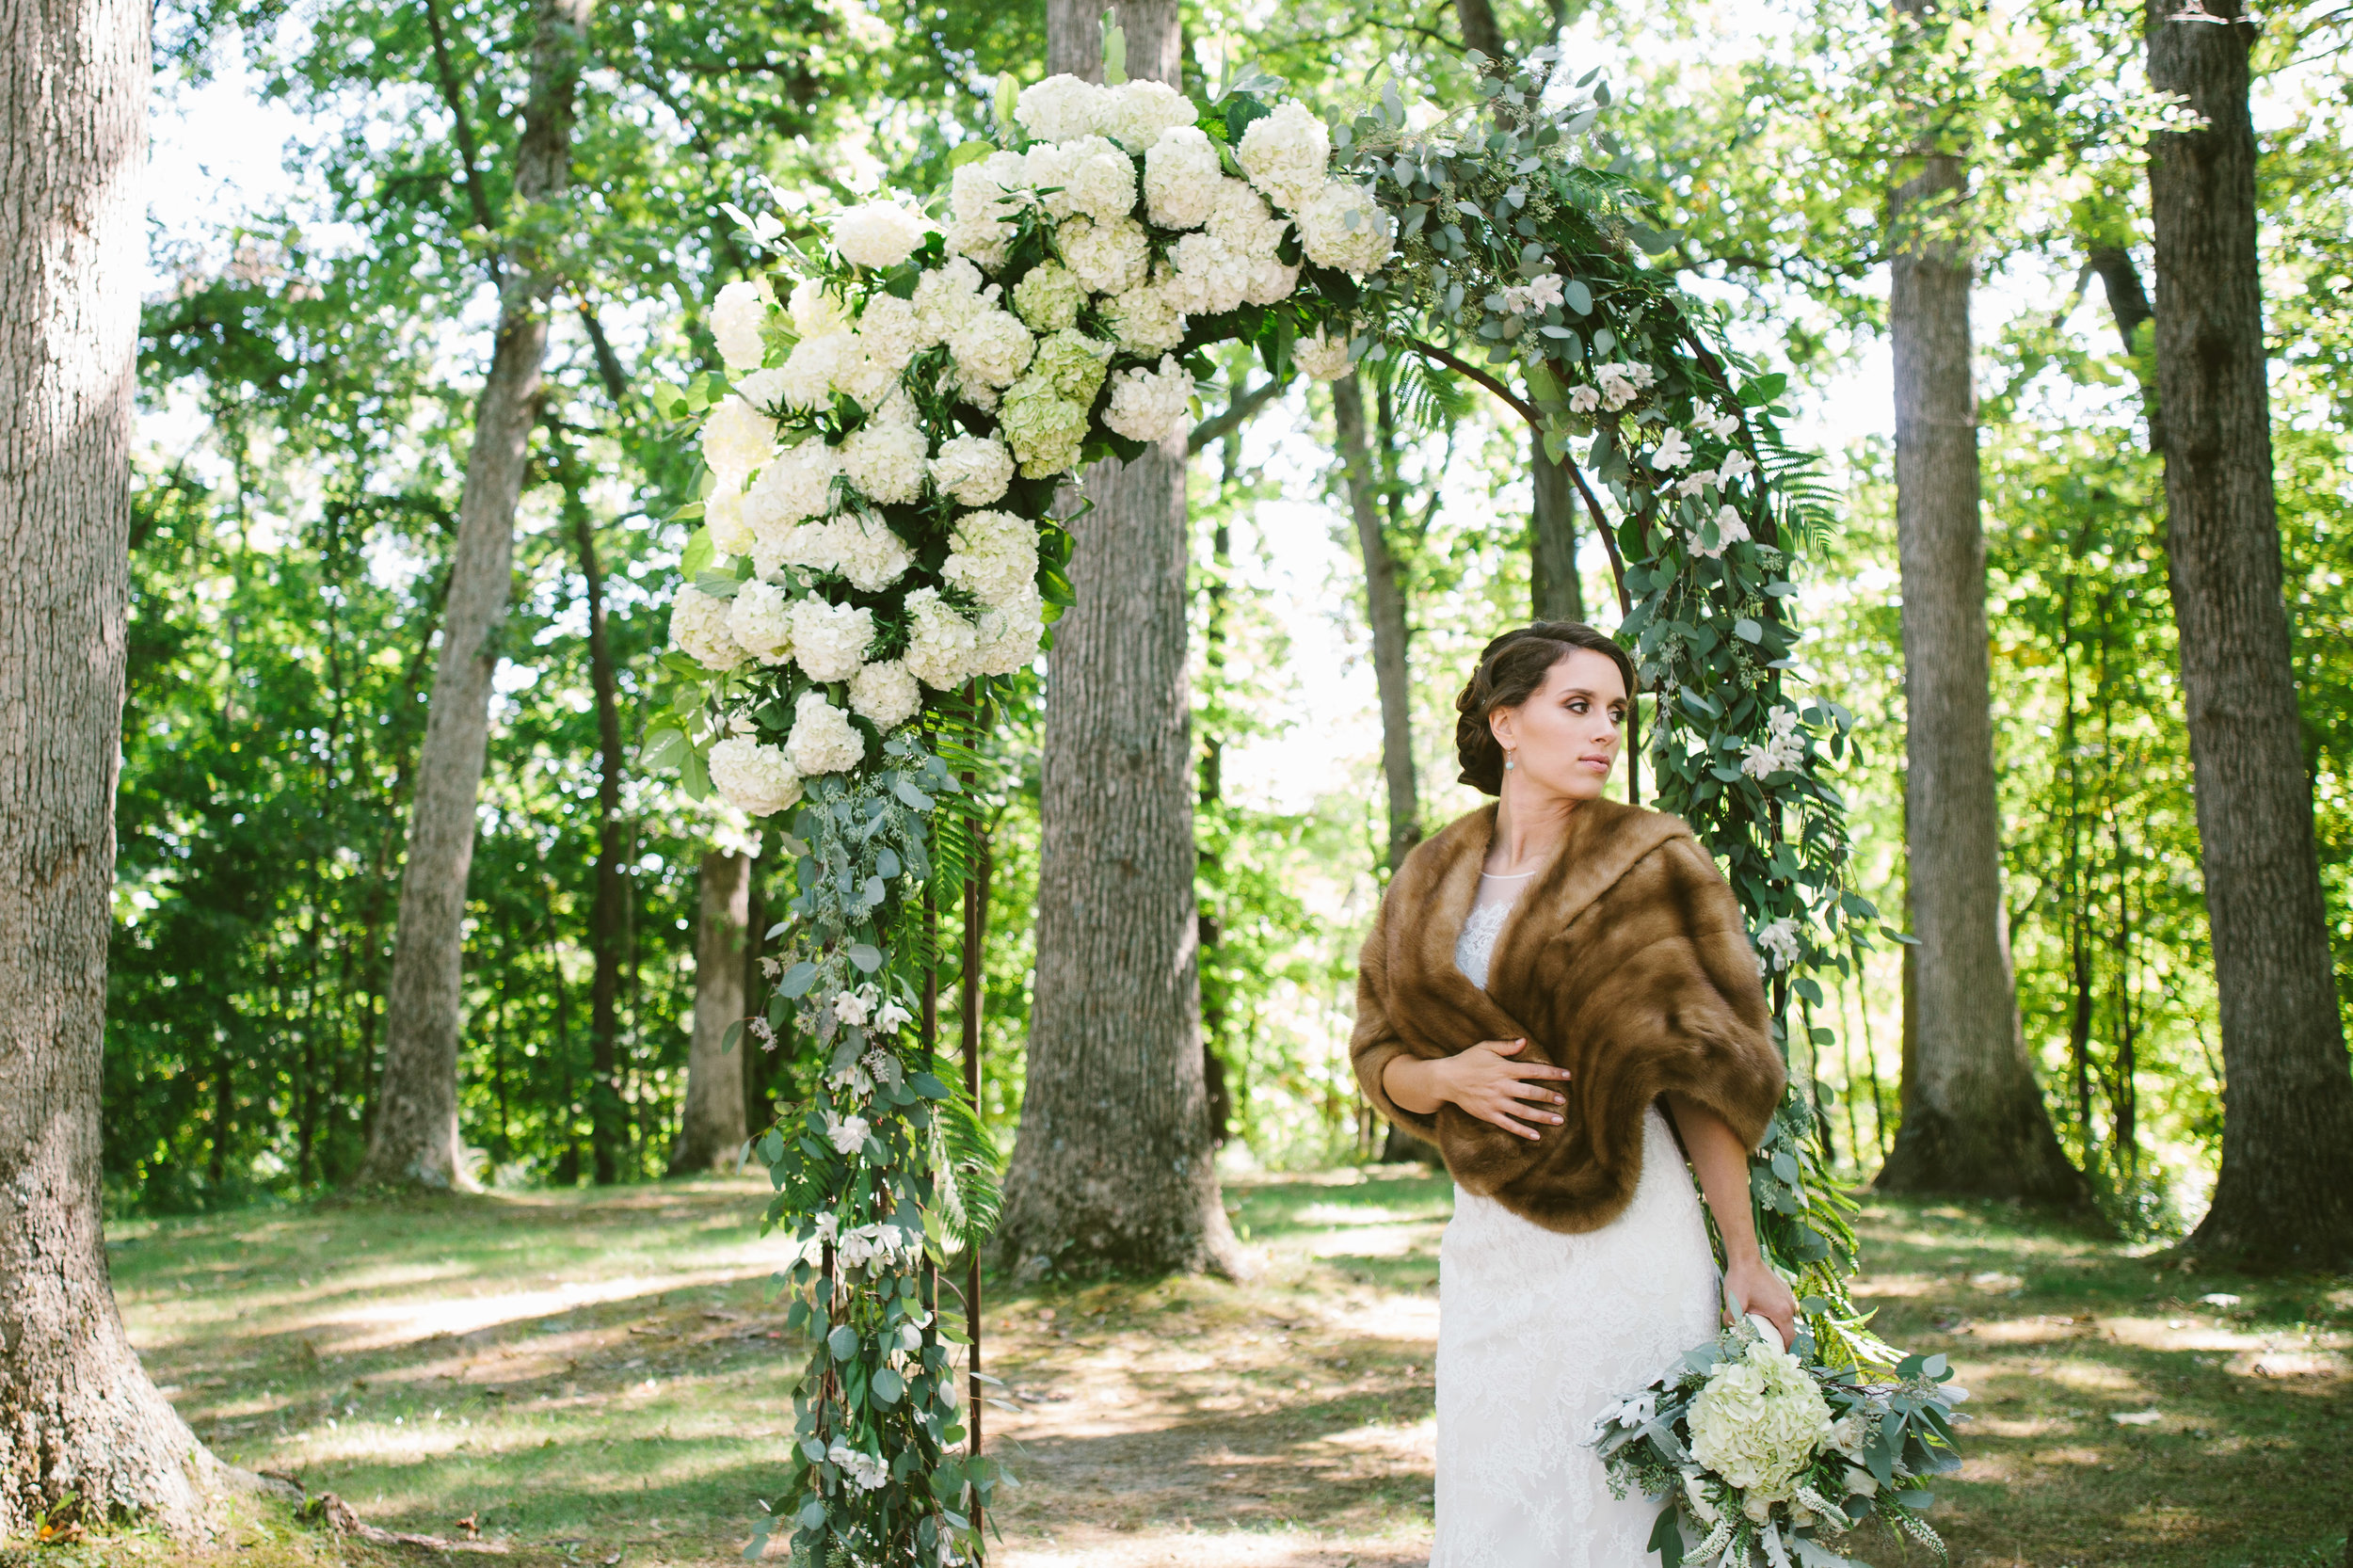 grand_rapids_wedding_rockford_wedding_richard_app_gallery_wedding_grand_rapids_wedding_photographer_summer_wedding_wabasis_lake_park_wedding_rustic_wedding-30.jpg